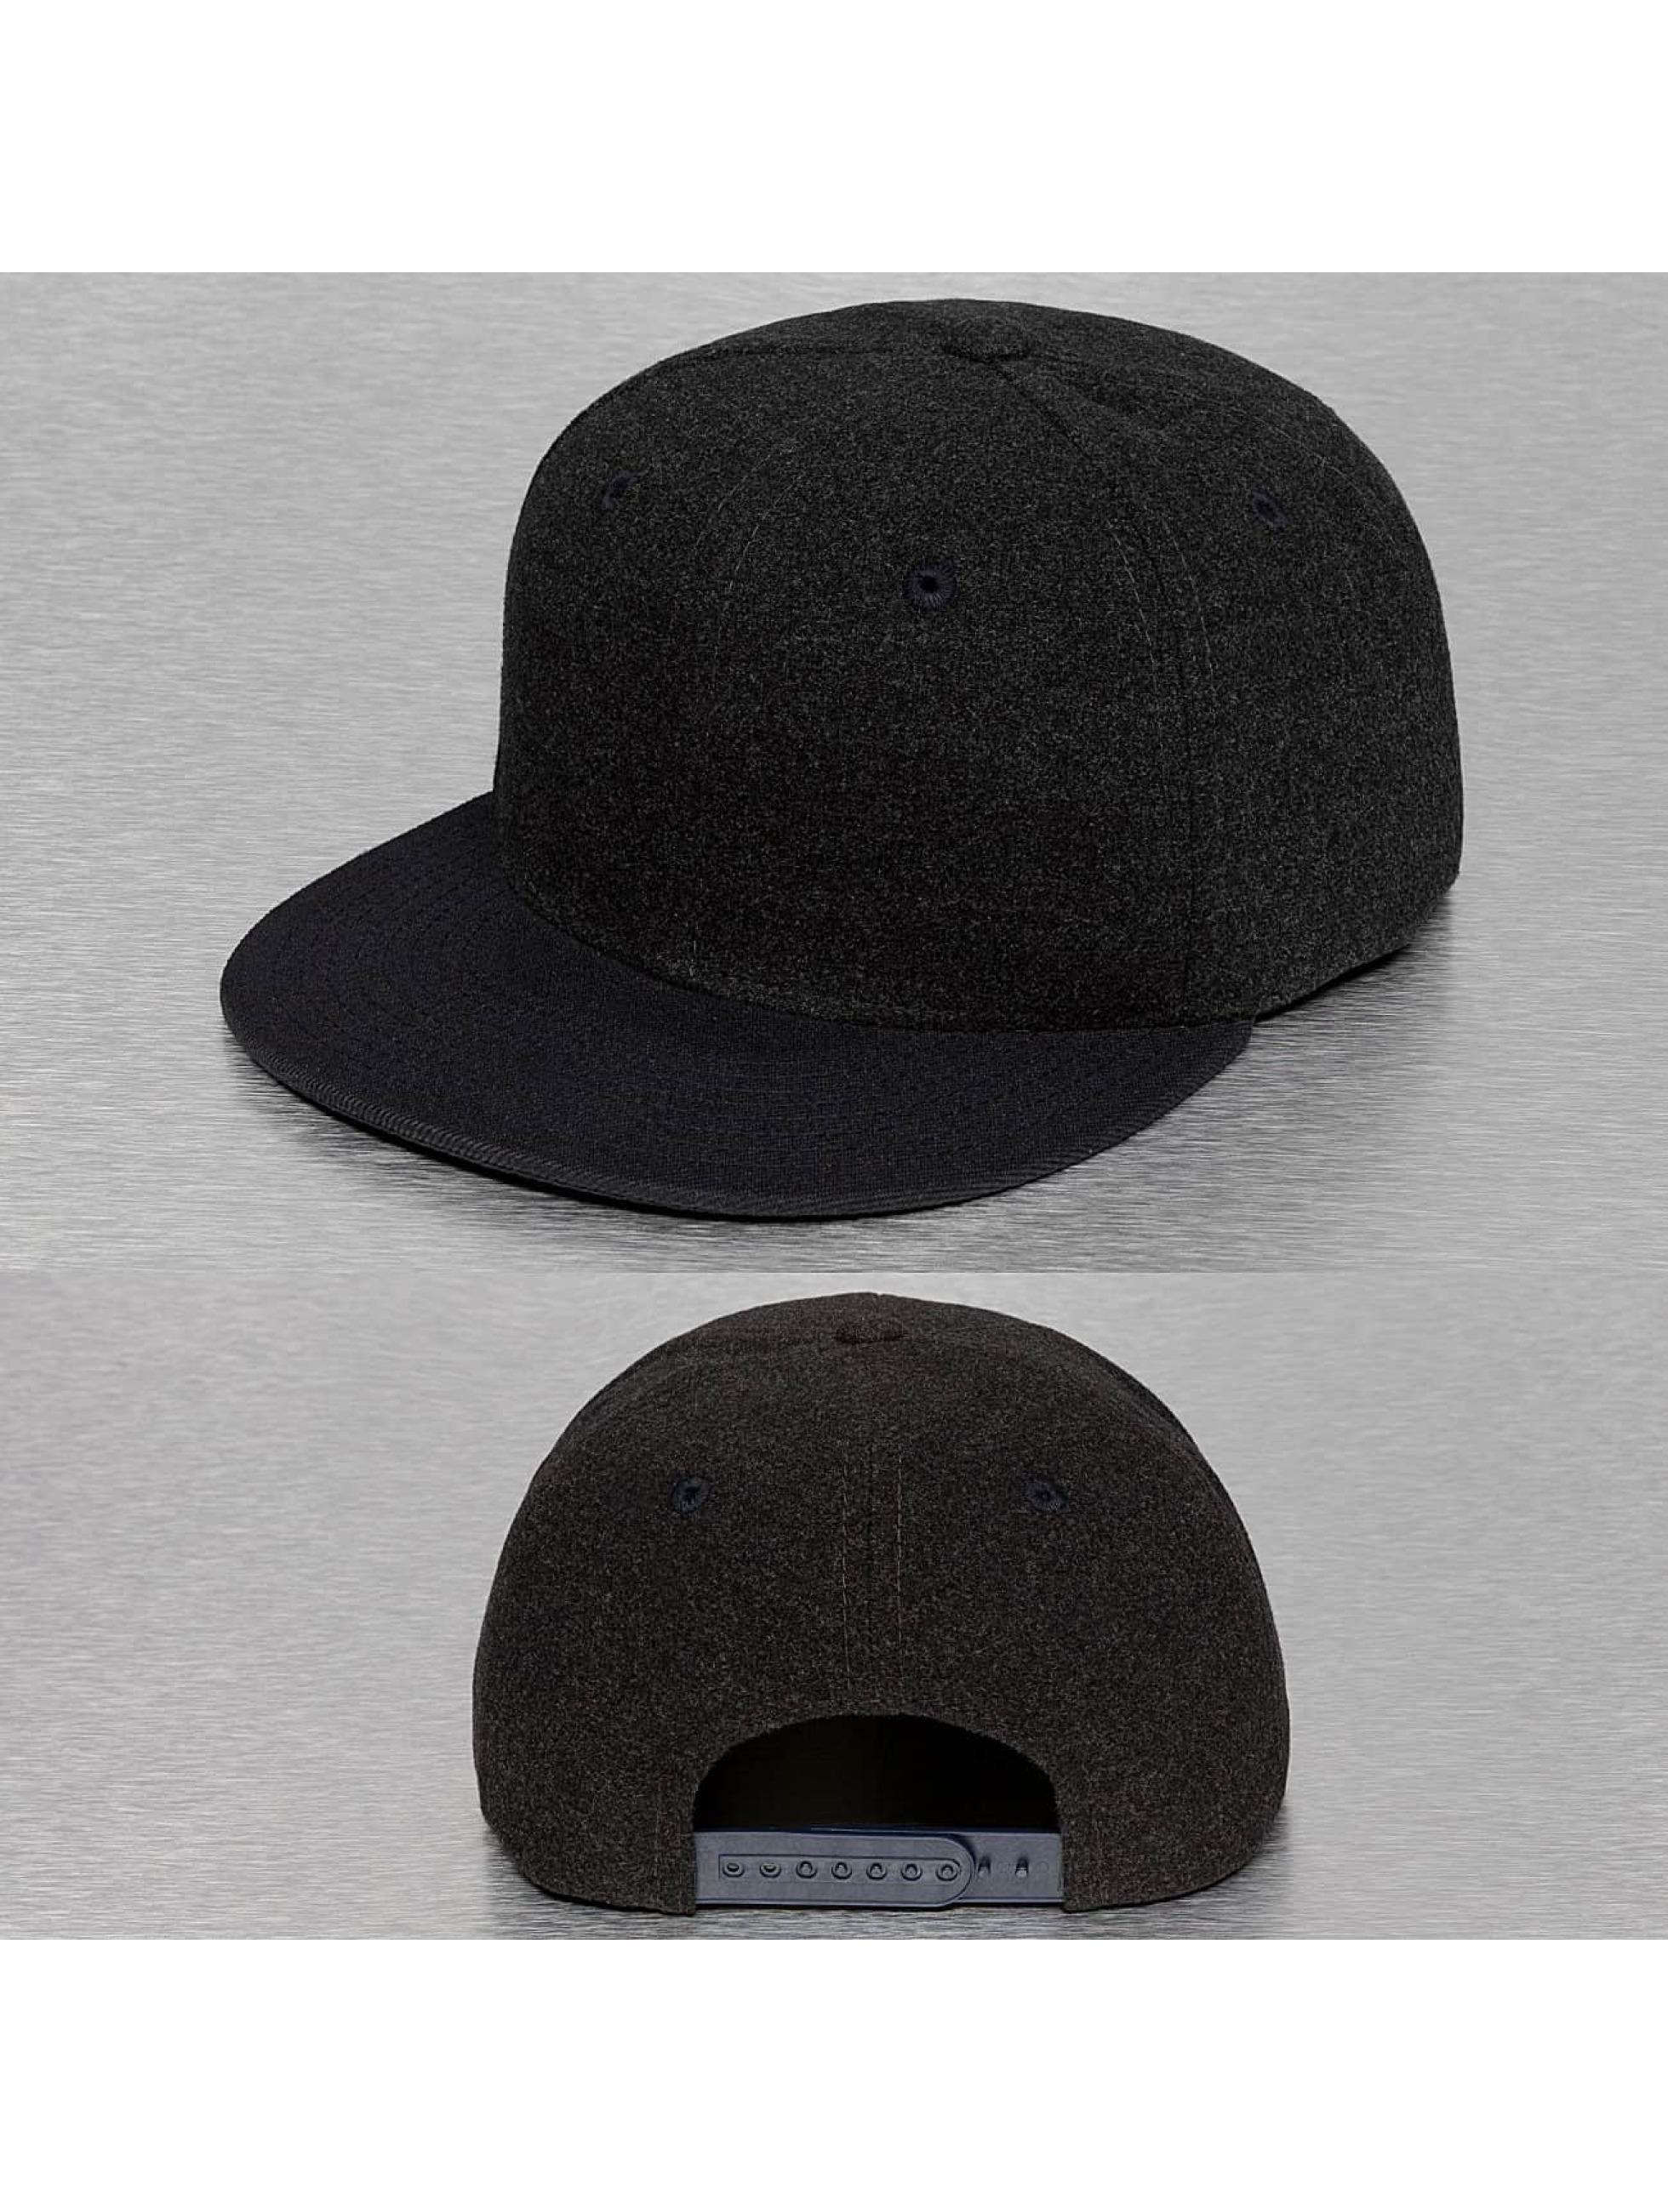 Cap Crony Casquette Snapback & Strapback Melton Crown gris